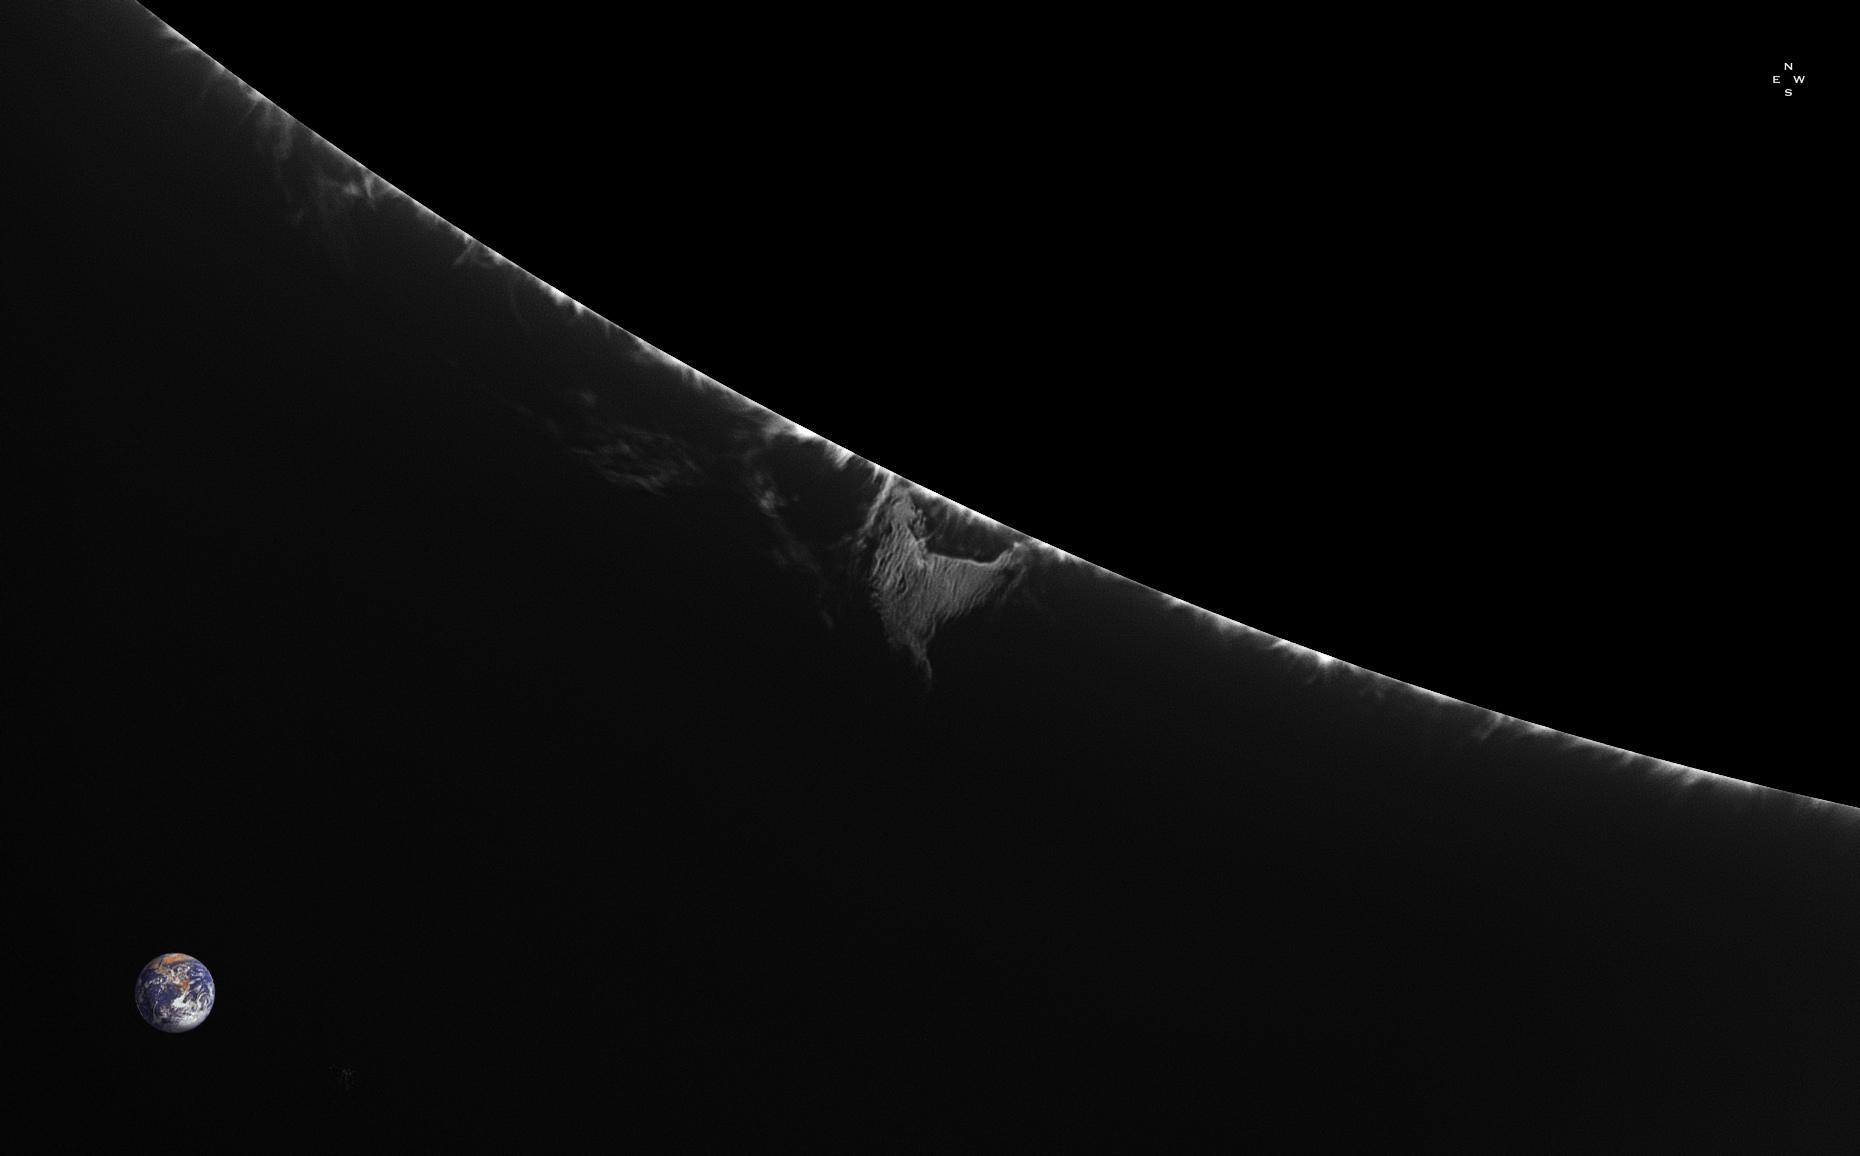 Limbe SSE - 14 Sept 2019